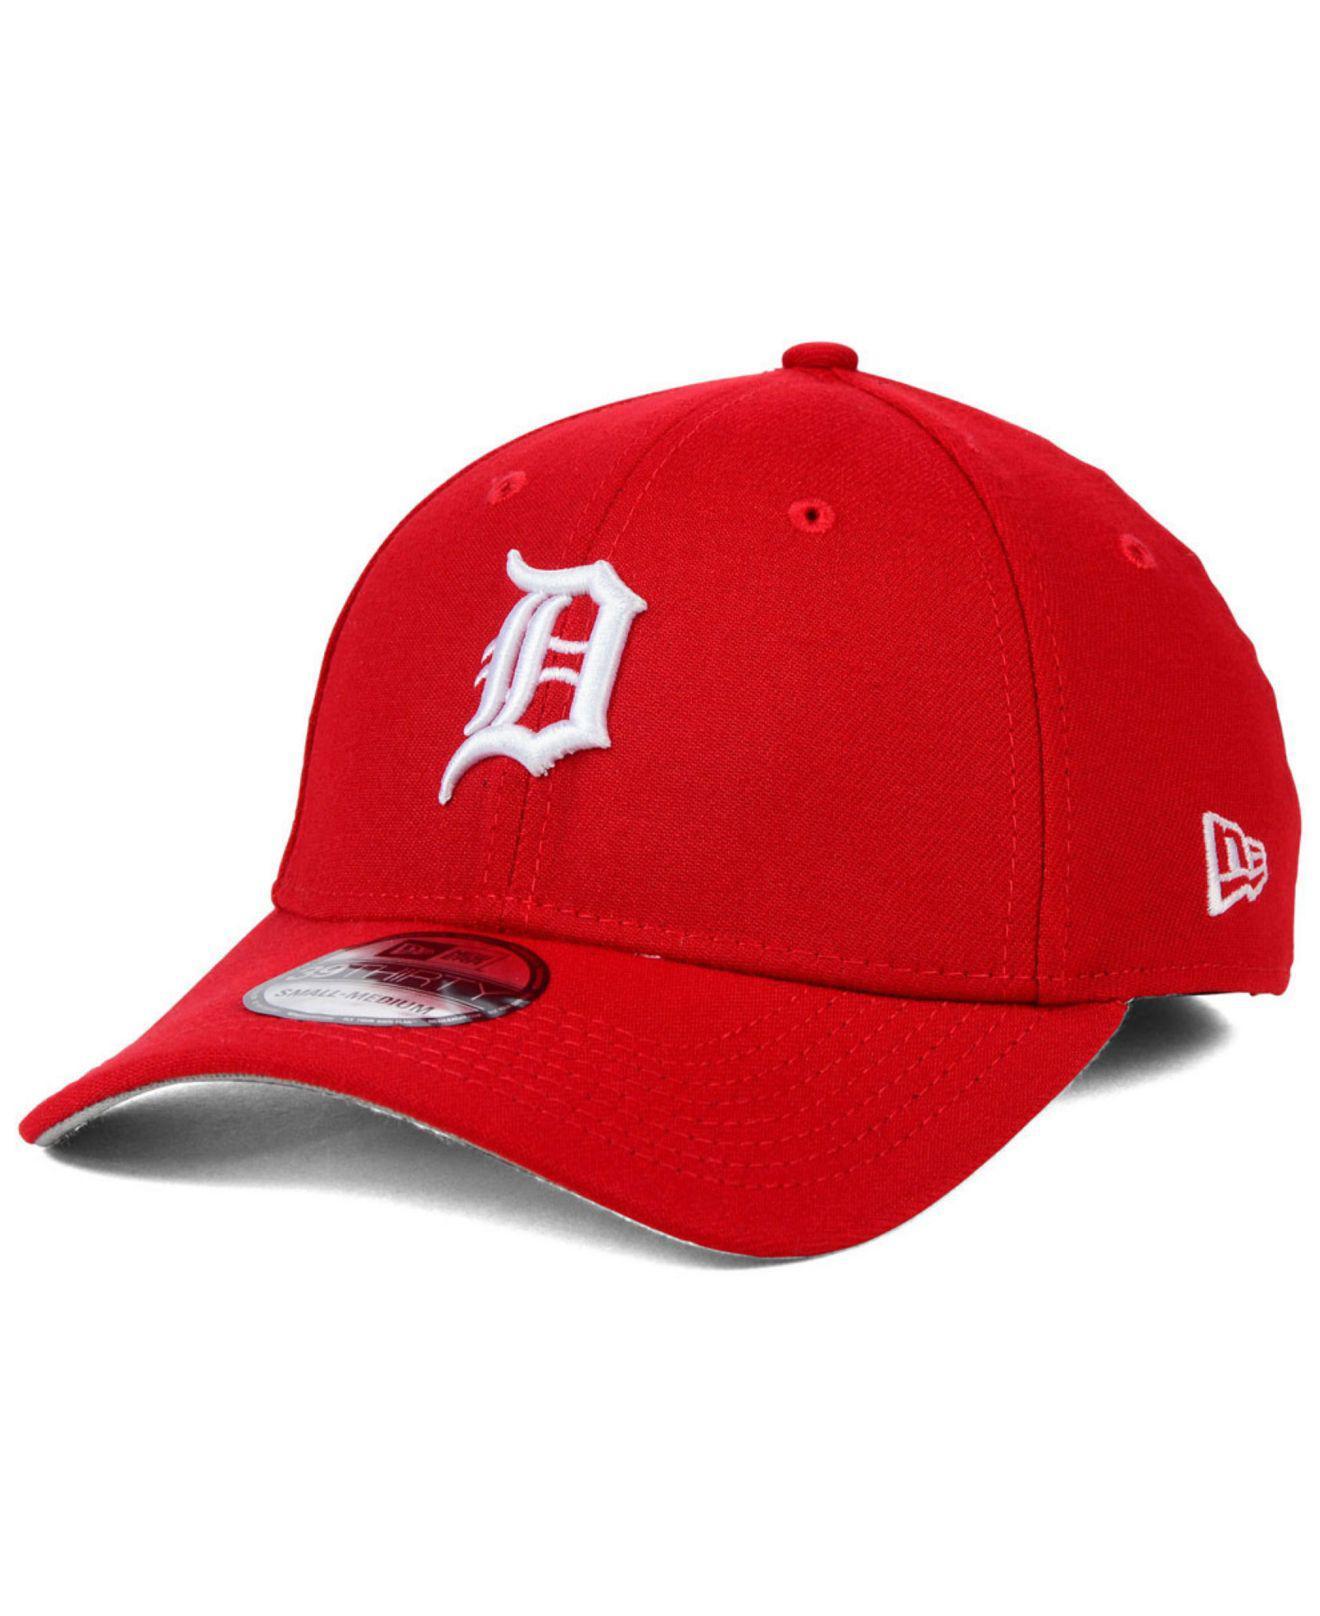 100% authentic e7c7e 4592e Lyst - KTZ Detroit Tigers Fashion 39thirty Cap in Red for Men